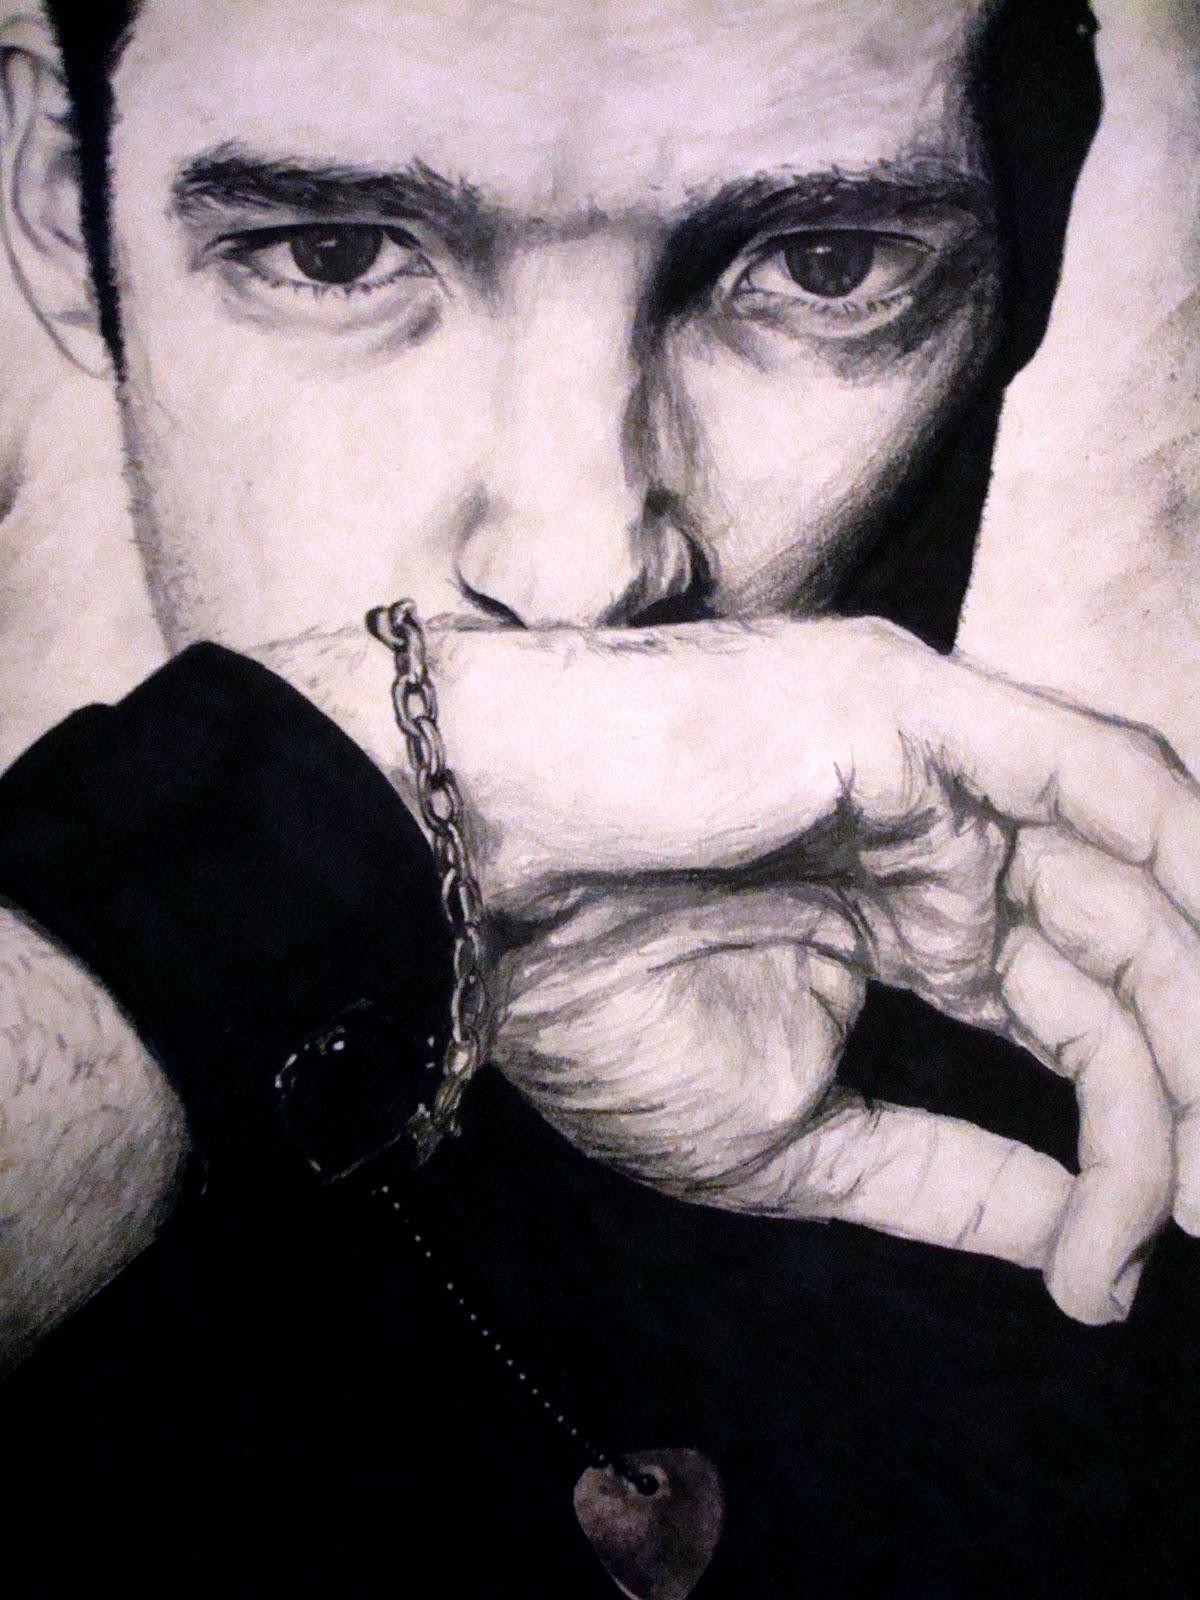 http://1.bp.blogspot.com/_rzb2SyEUbMU/TLe1OpWbgoI/AAAAAAAAACk/ttJ8bNvhtoQ/s1600/Justin+Timberlake.jpg